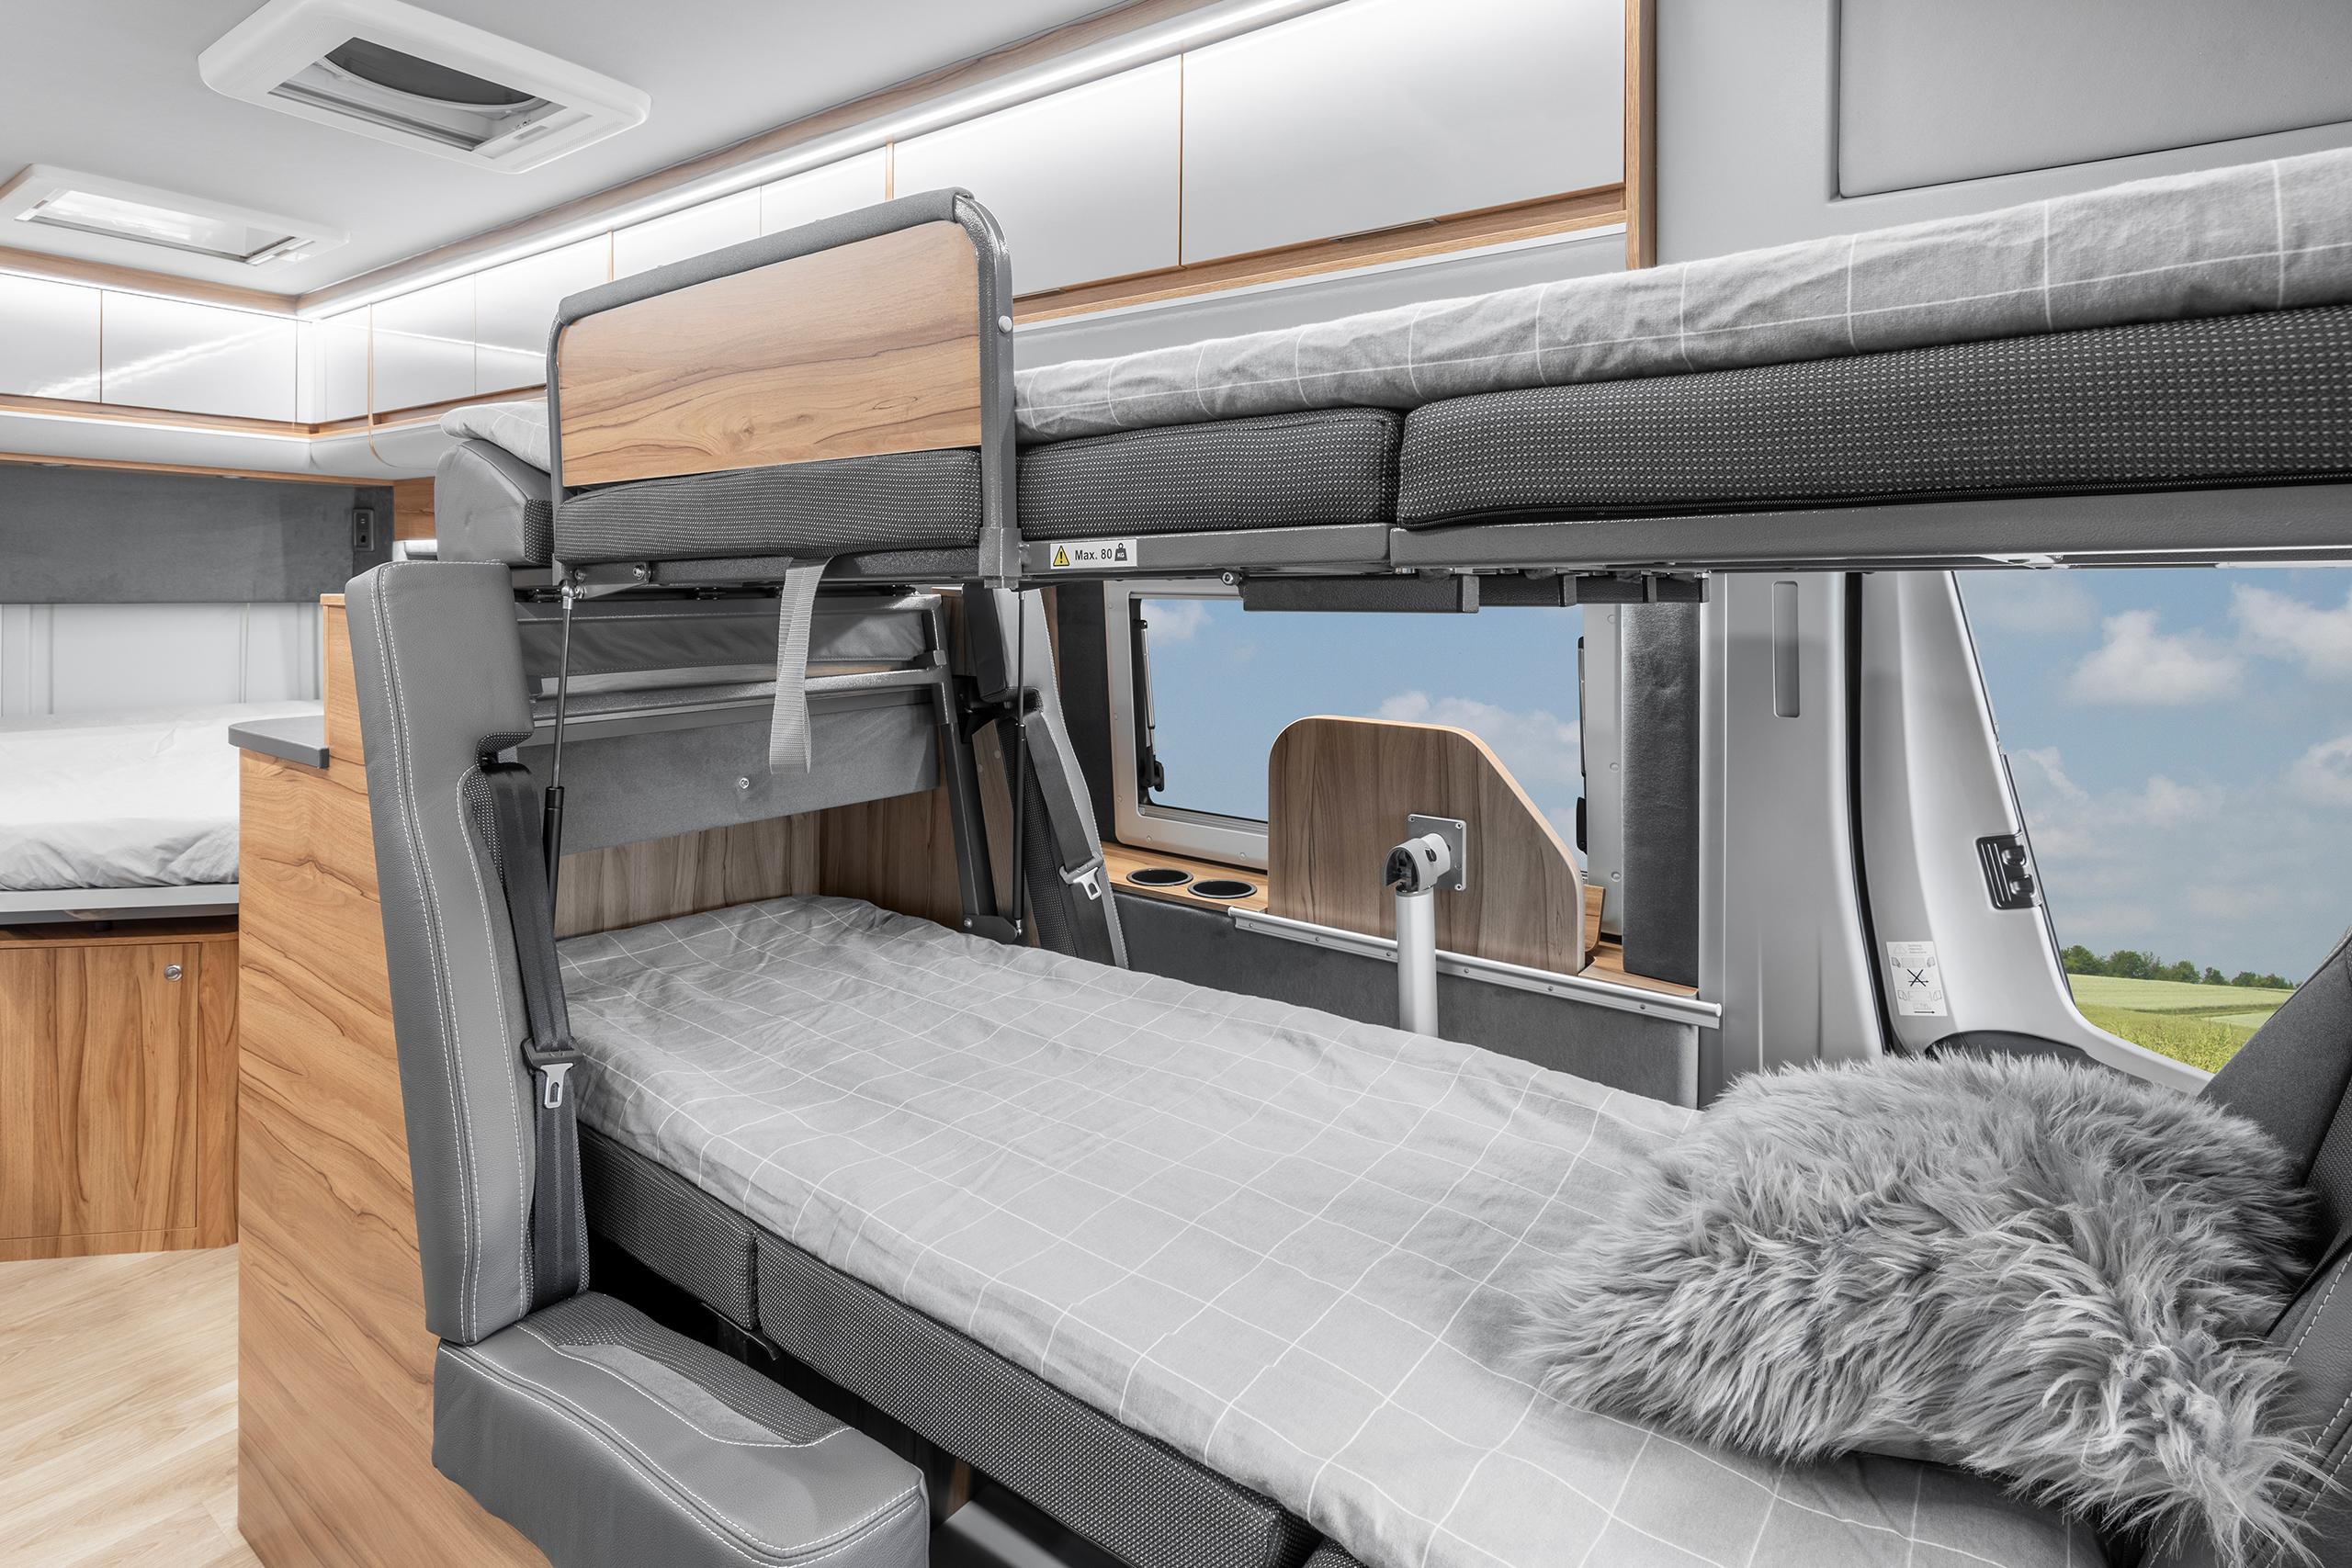 Bunk bed in a campervan